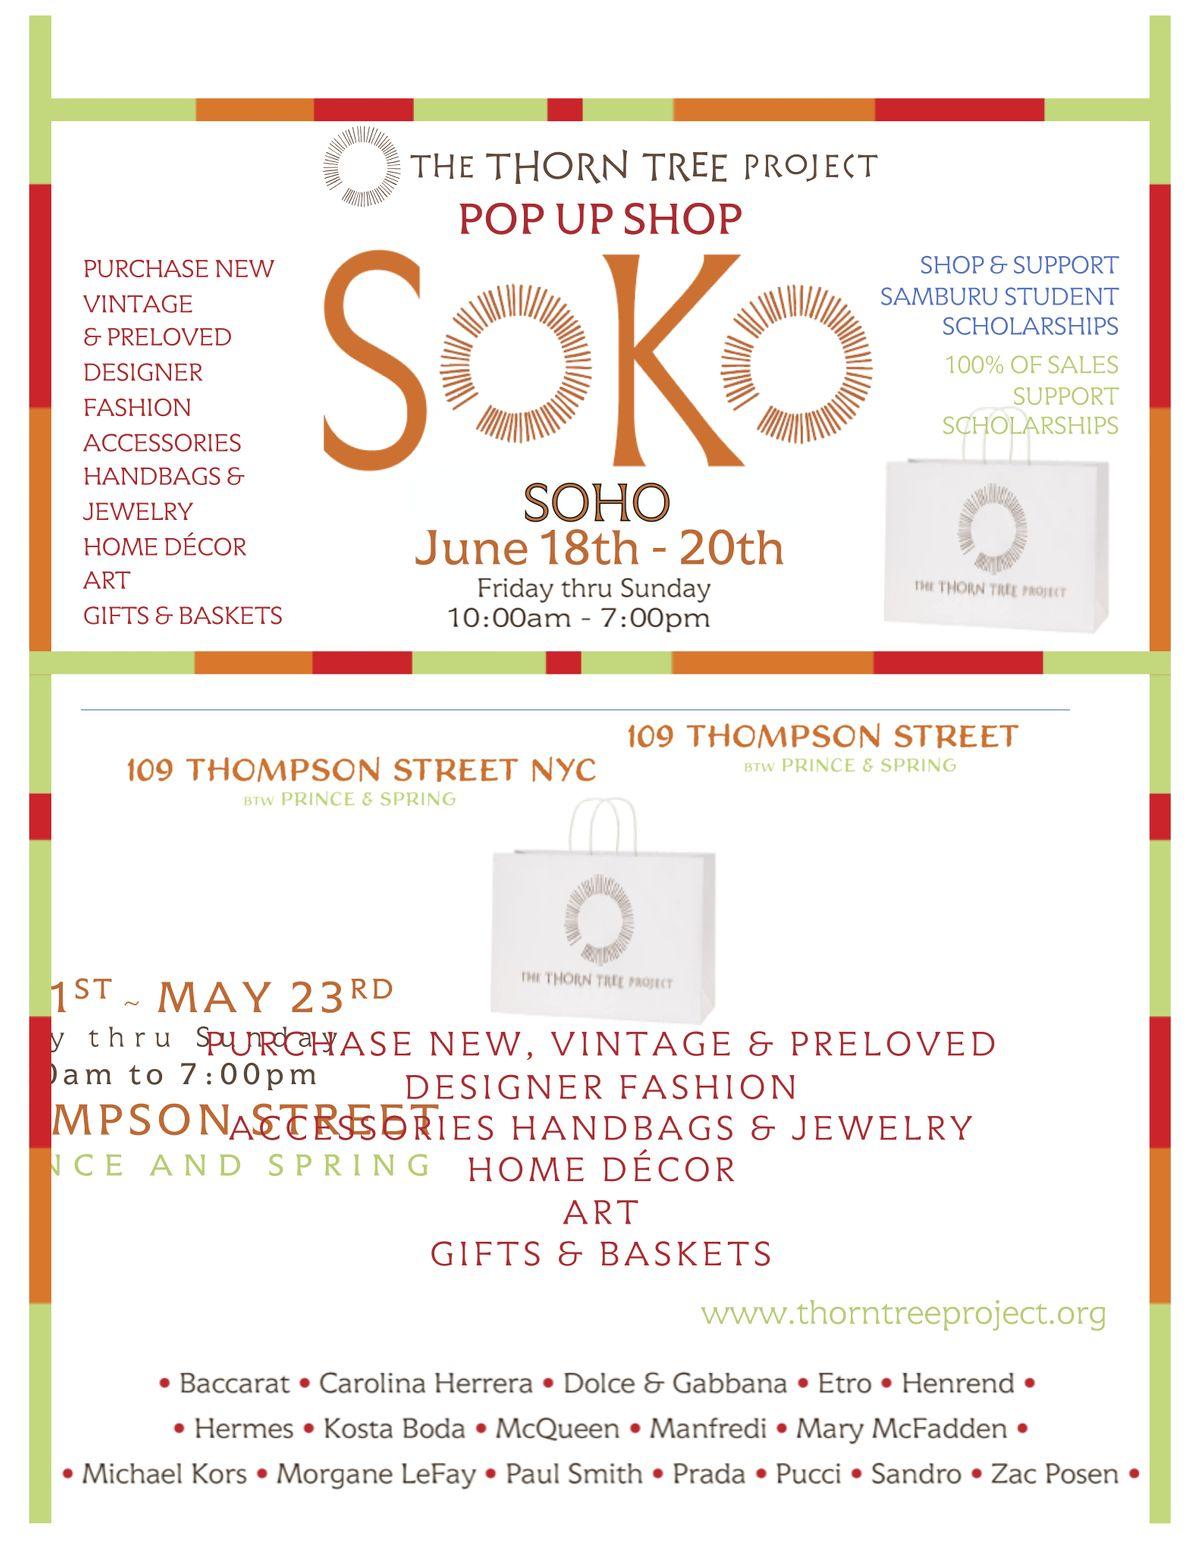 Shop *SOKO* Soho Pop Up Shop for Samburu Student Scholarships!